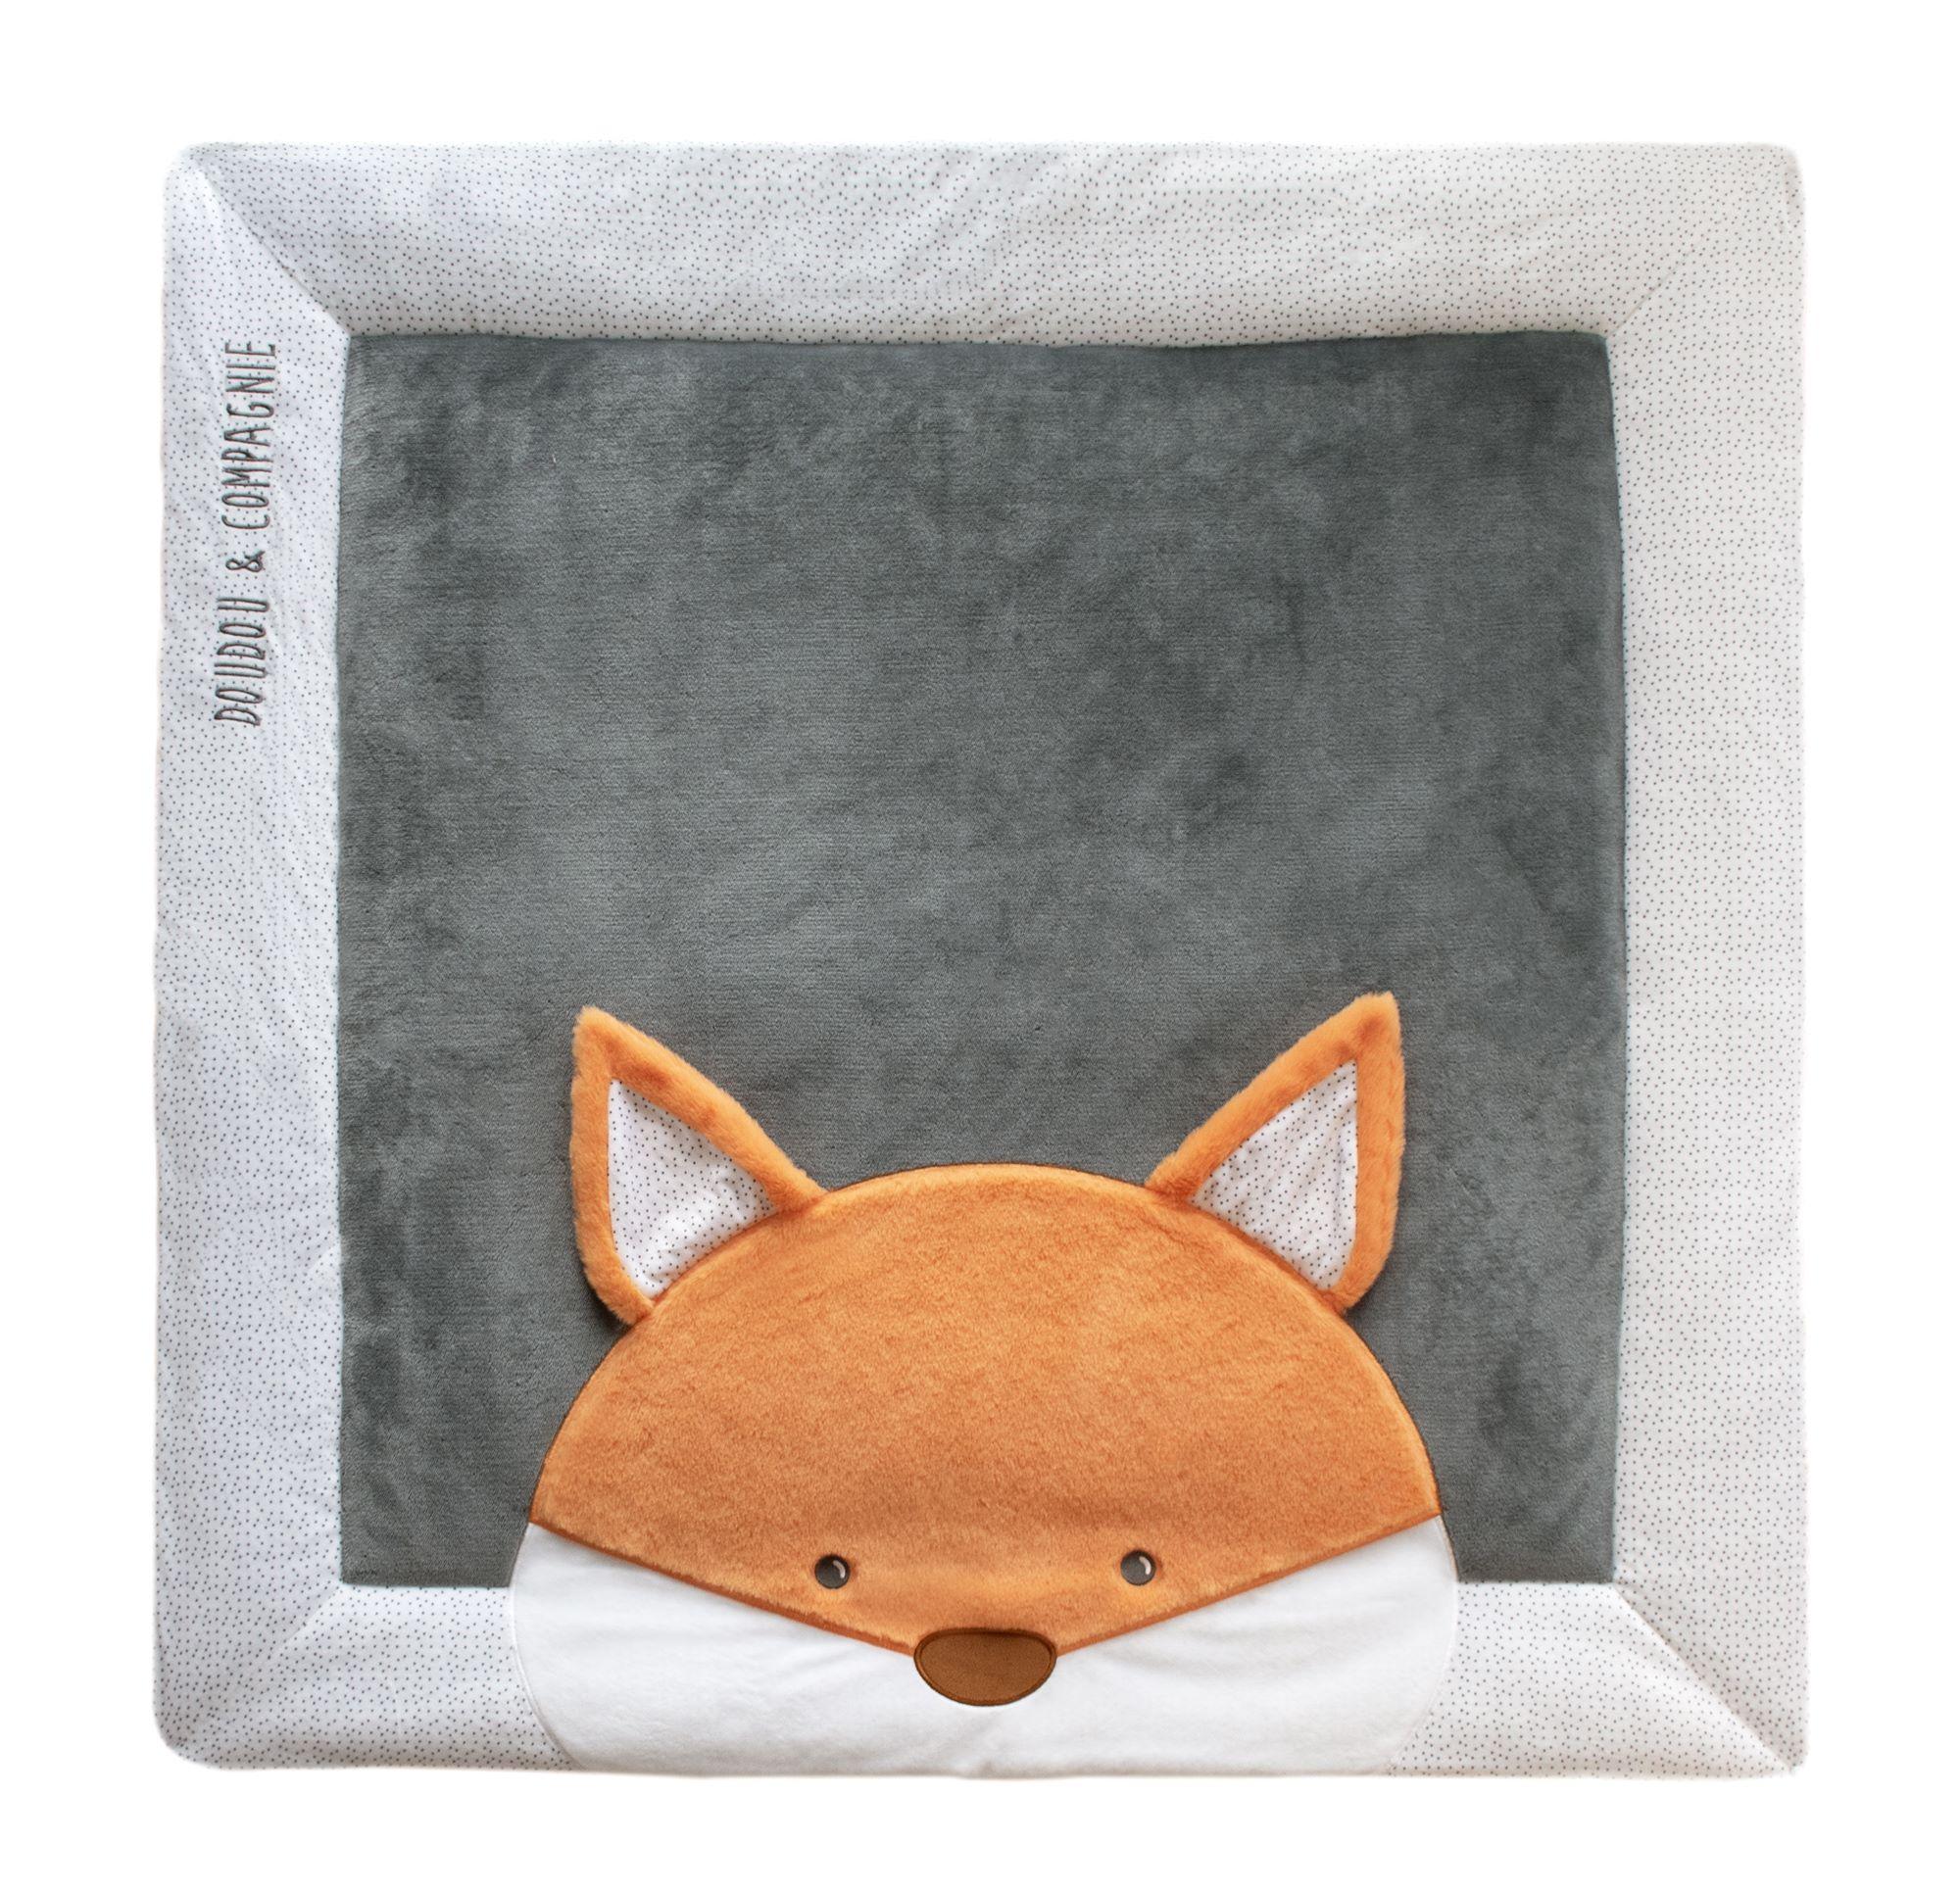 tapis d eveil pour bebe renard tapidou doudou compagnie